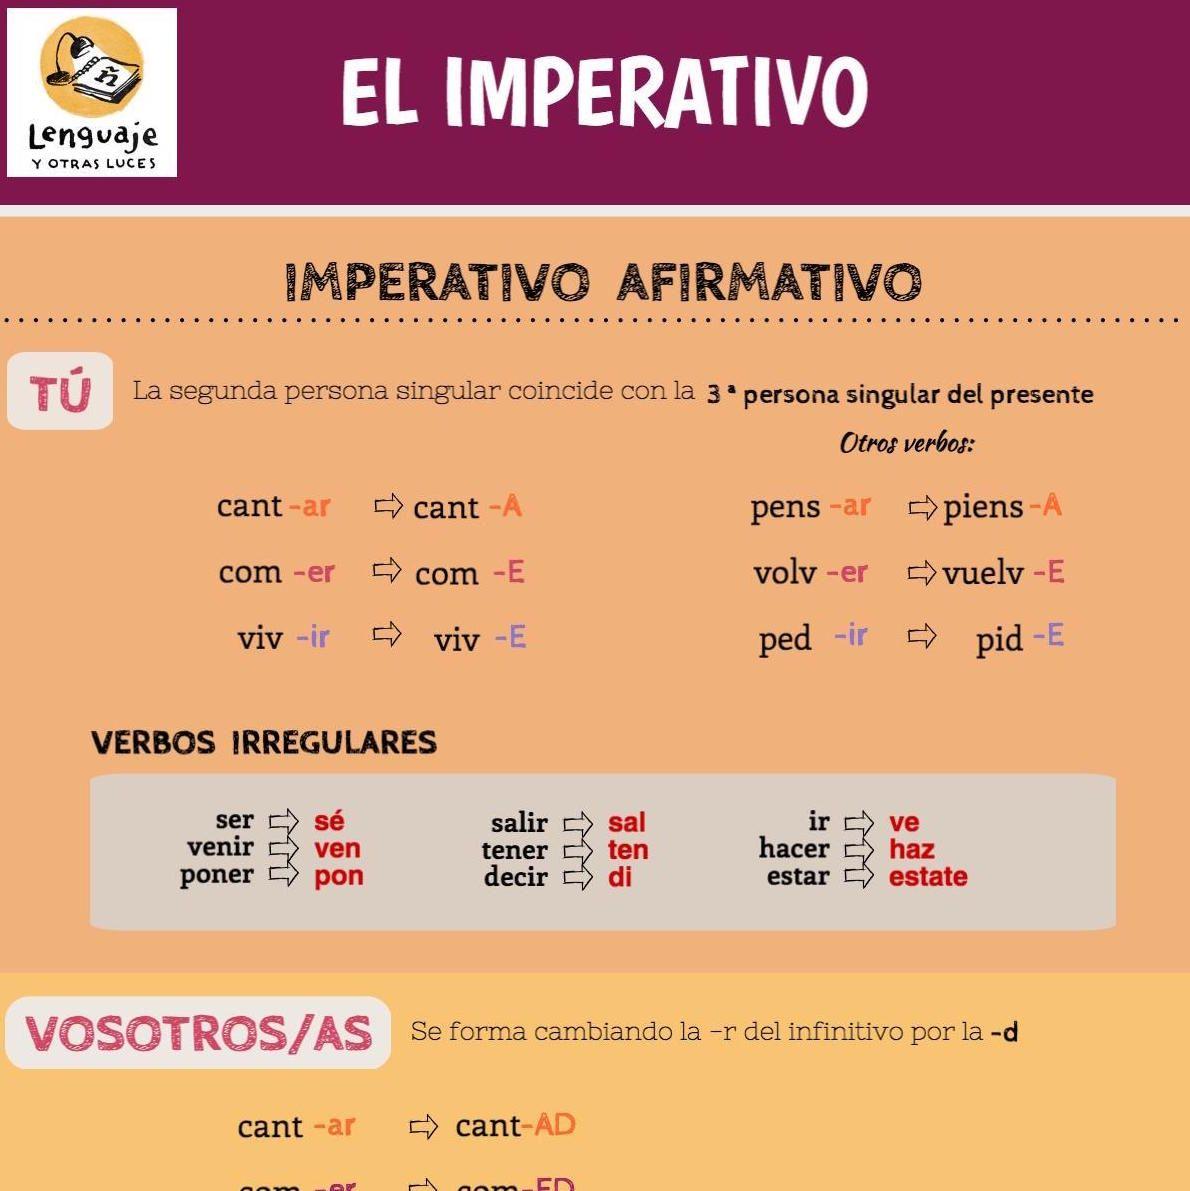 La Formacion Del Modo Imperativo En Espanol Infografia